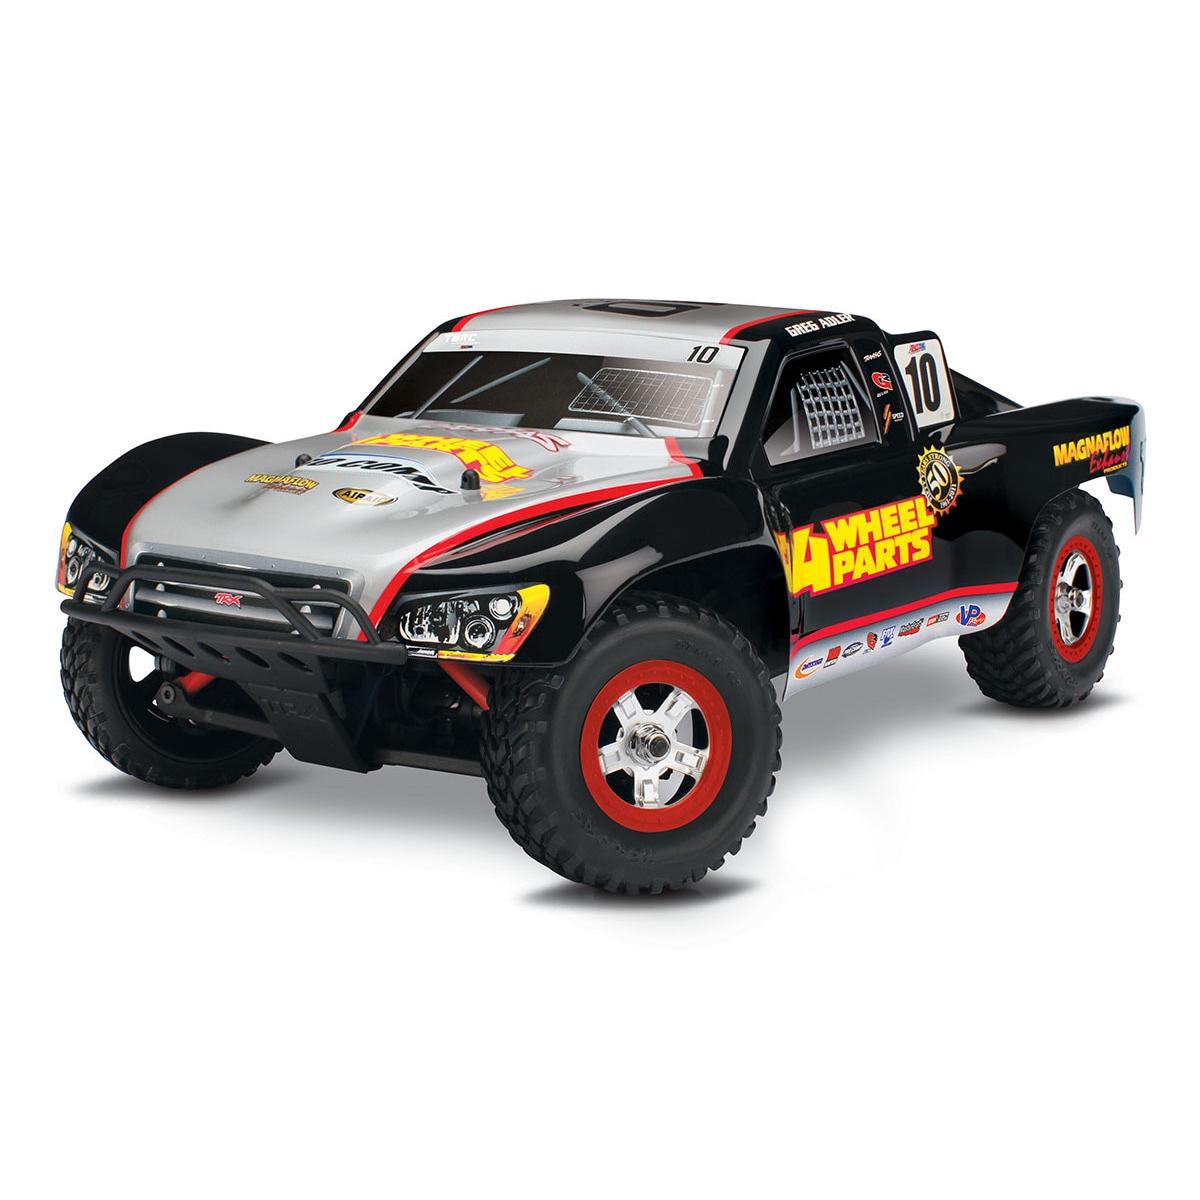 Traxxas Slash 4x4, 4WD Short-Course Truck (1/16) (Black &...